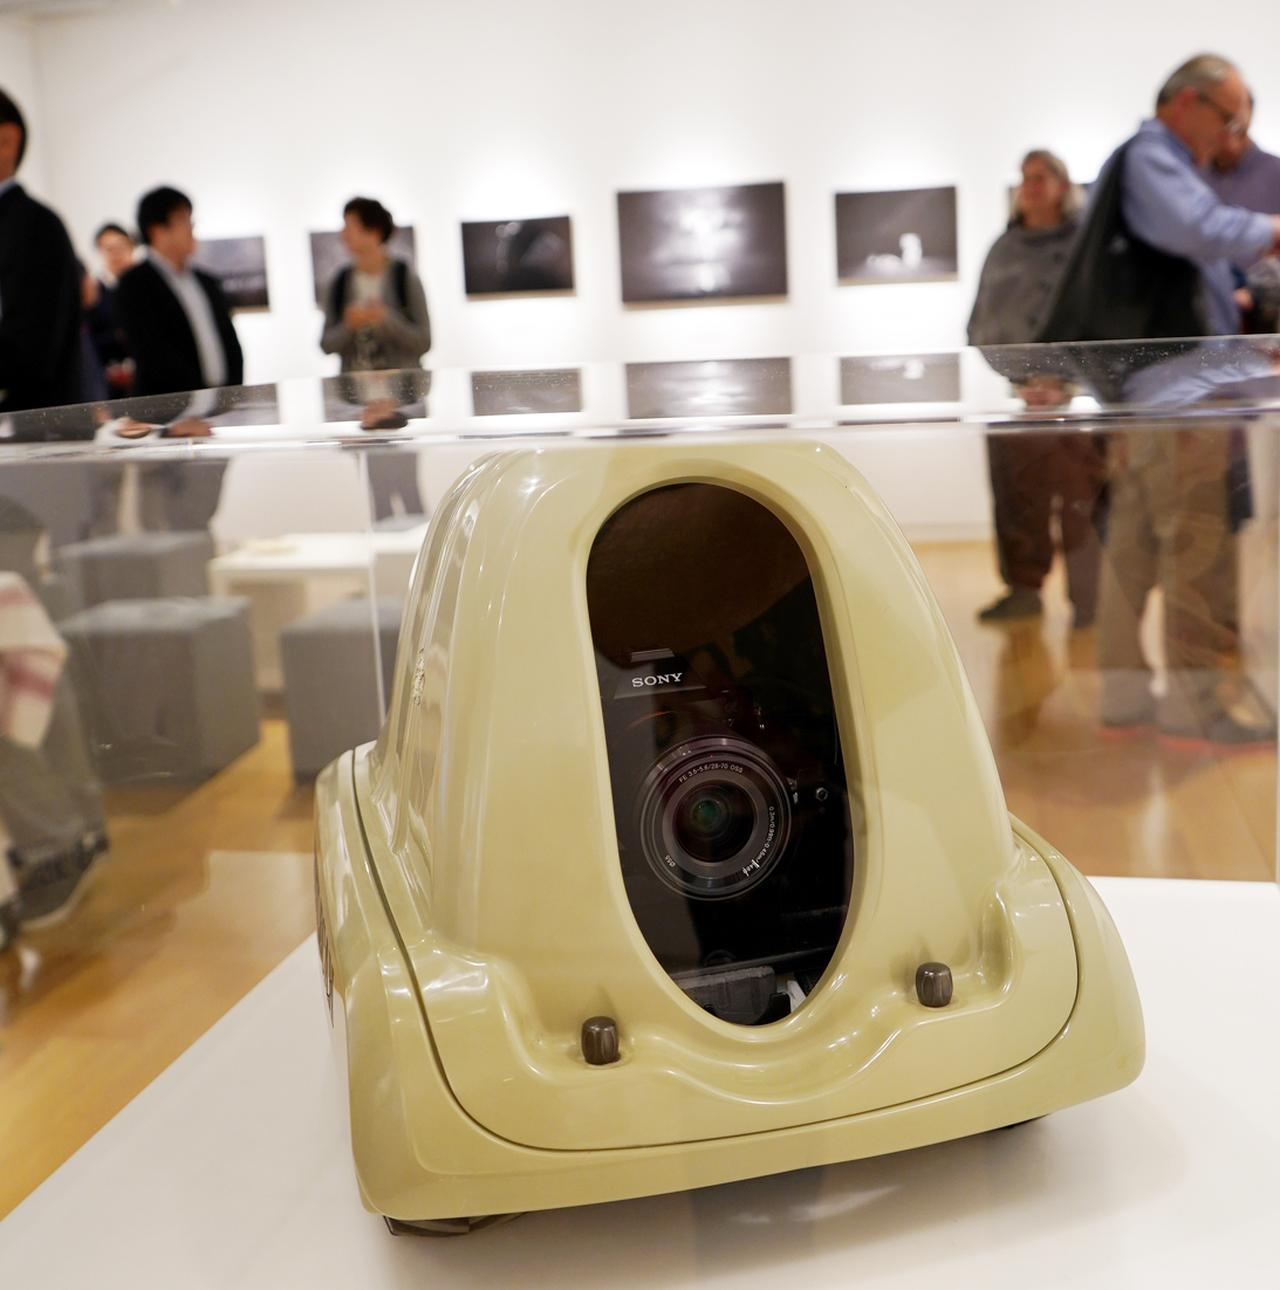 画像: Beetlecam